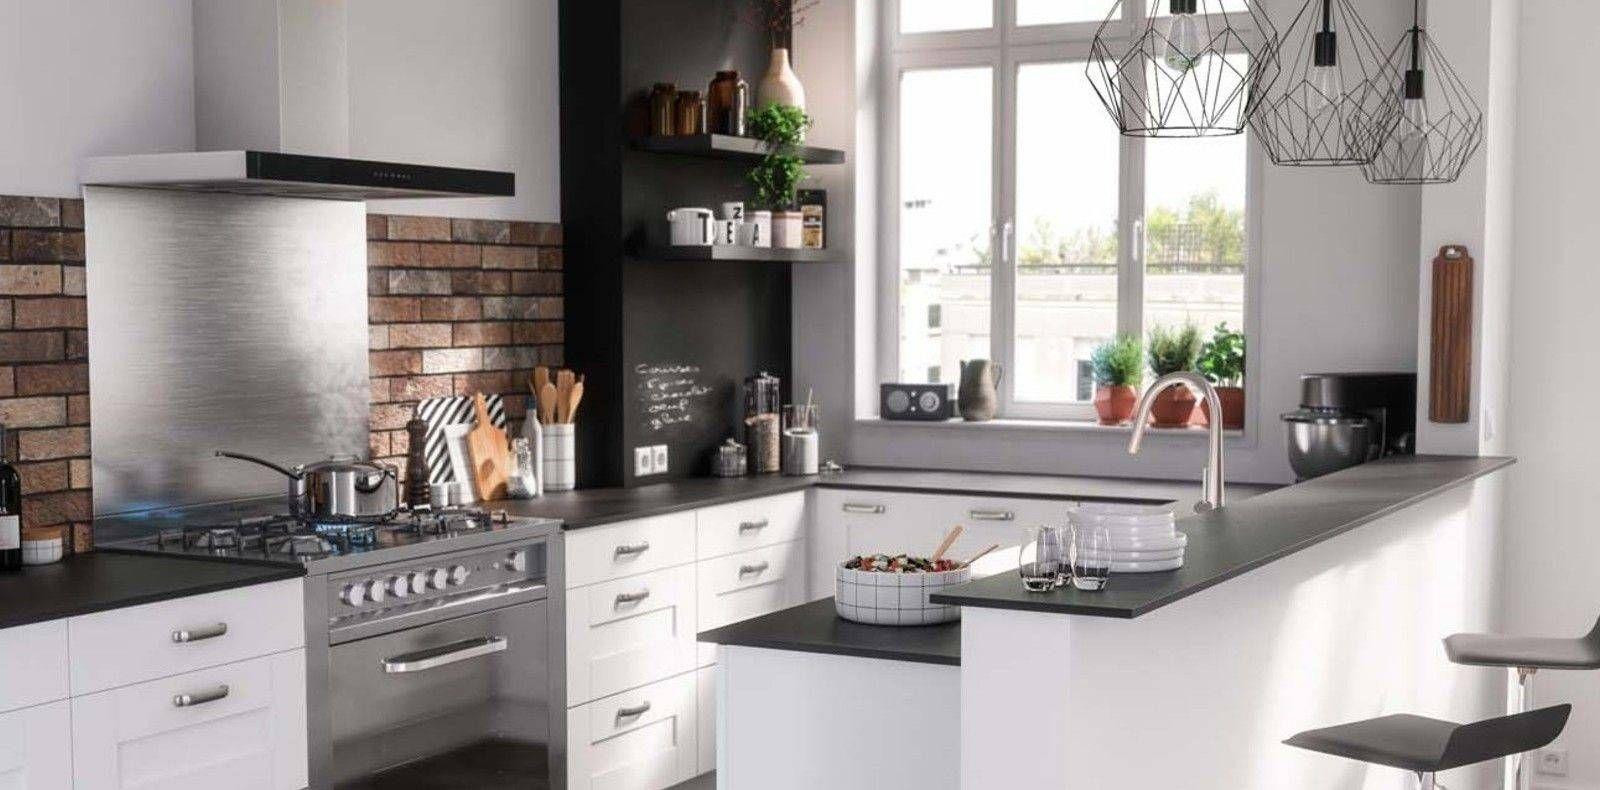 24 astuces inattendues pour organiser sa cuisine la. Black Bedroom Furniture Sets. Home Design Ideas